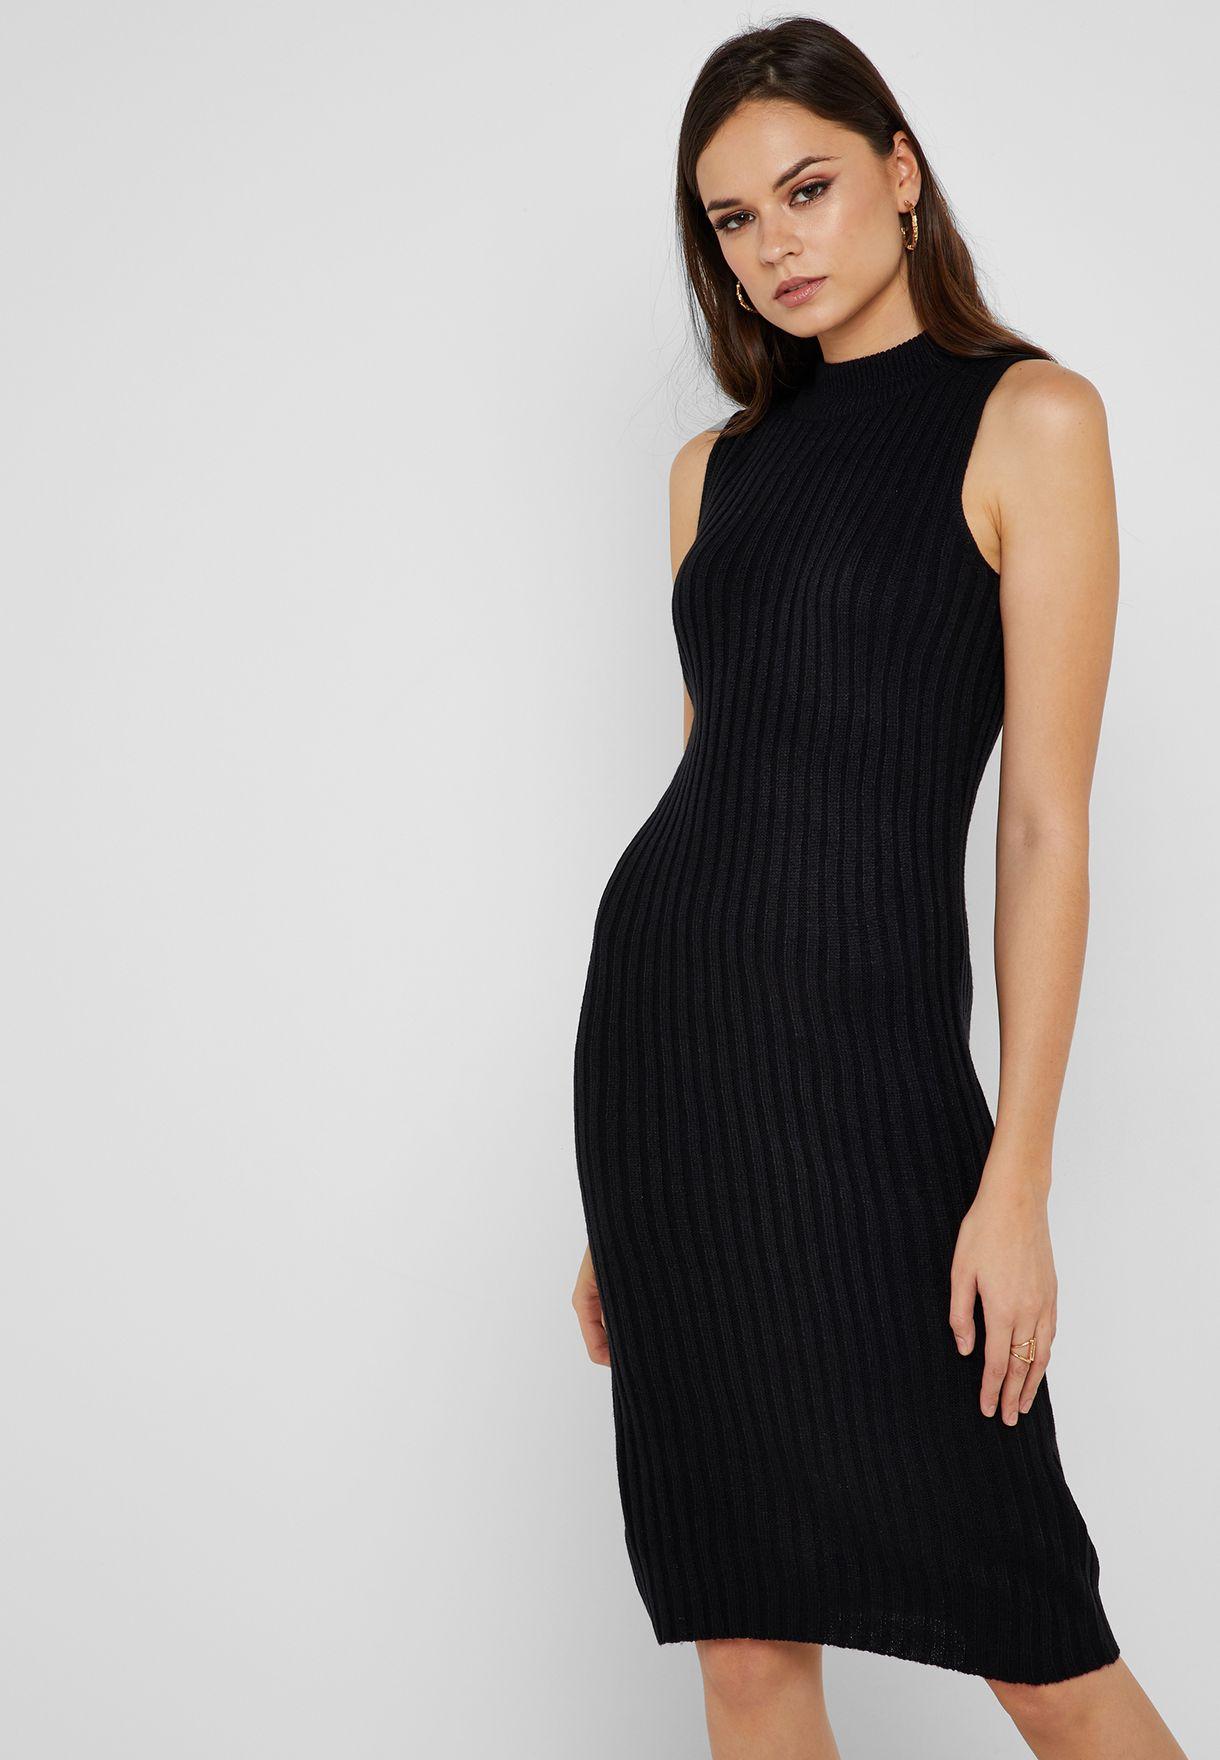 776671b51a014e Shop Ginger black High Neck Ribbed Midi Dress LK-230ANGIE for Women ...